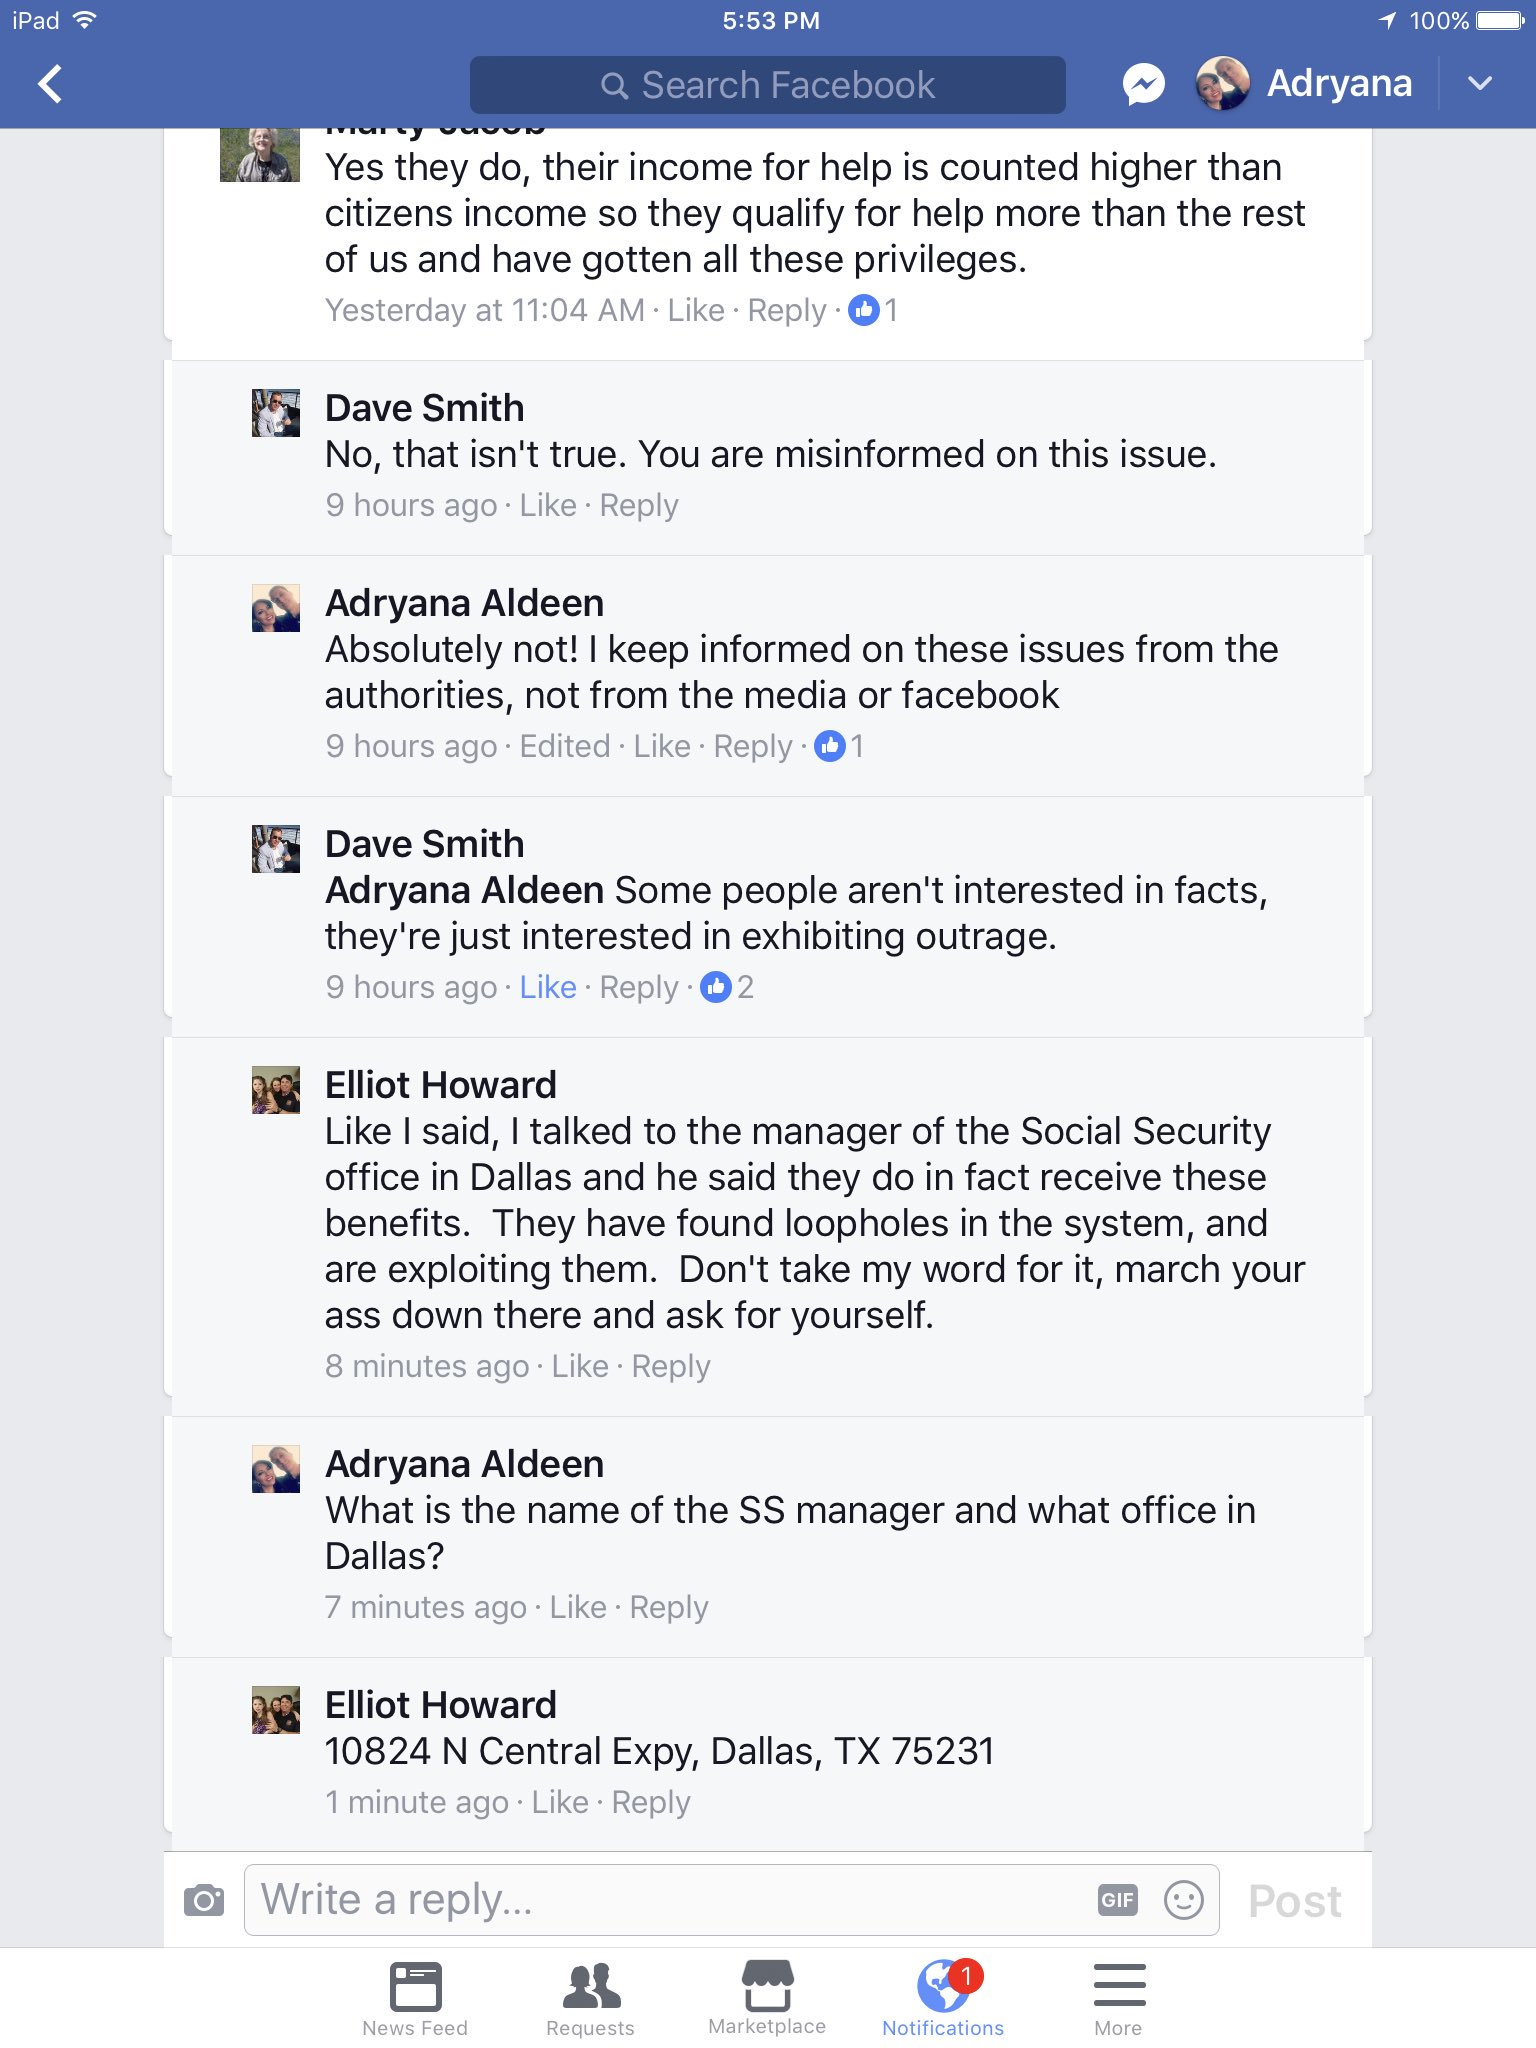 Adryana Aldeen on Twitter ElliotHoward says SocialSecurity